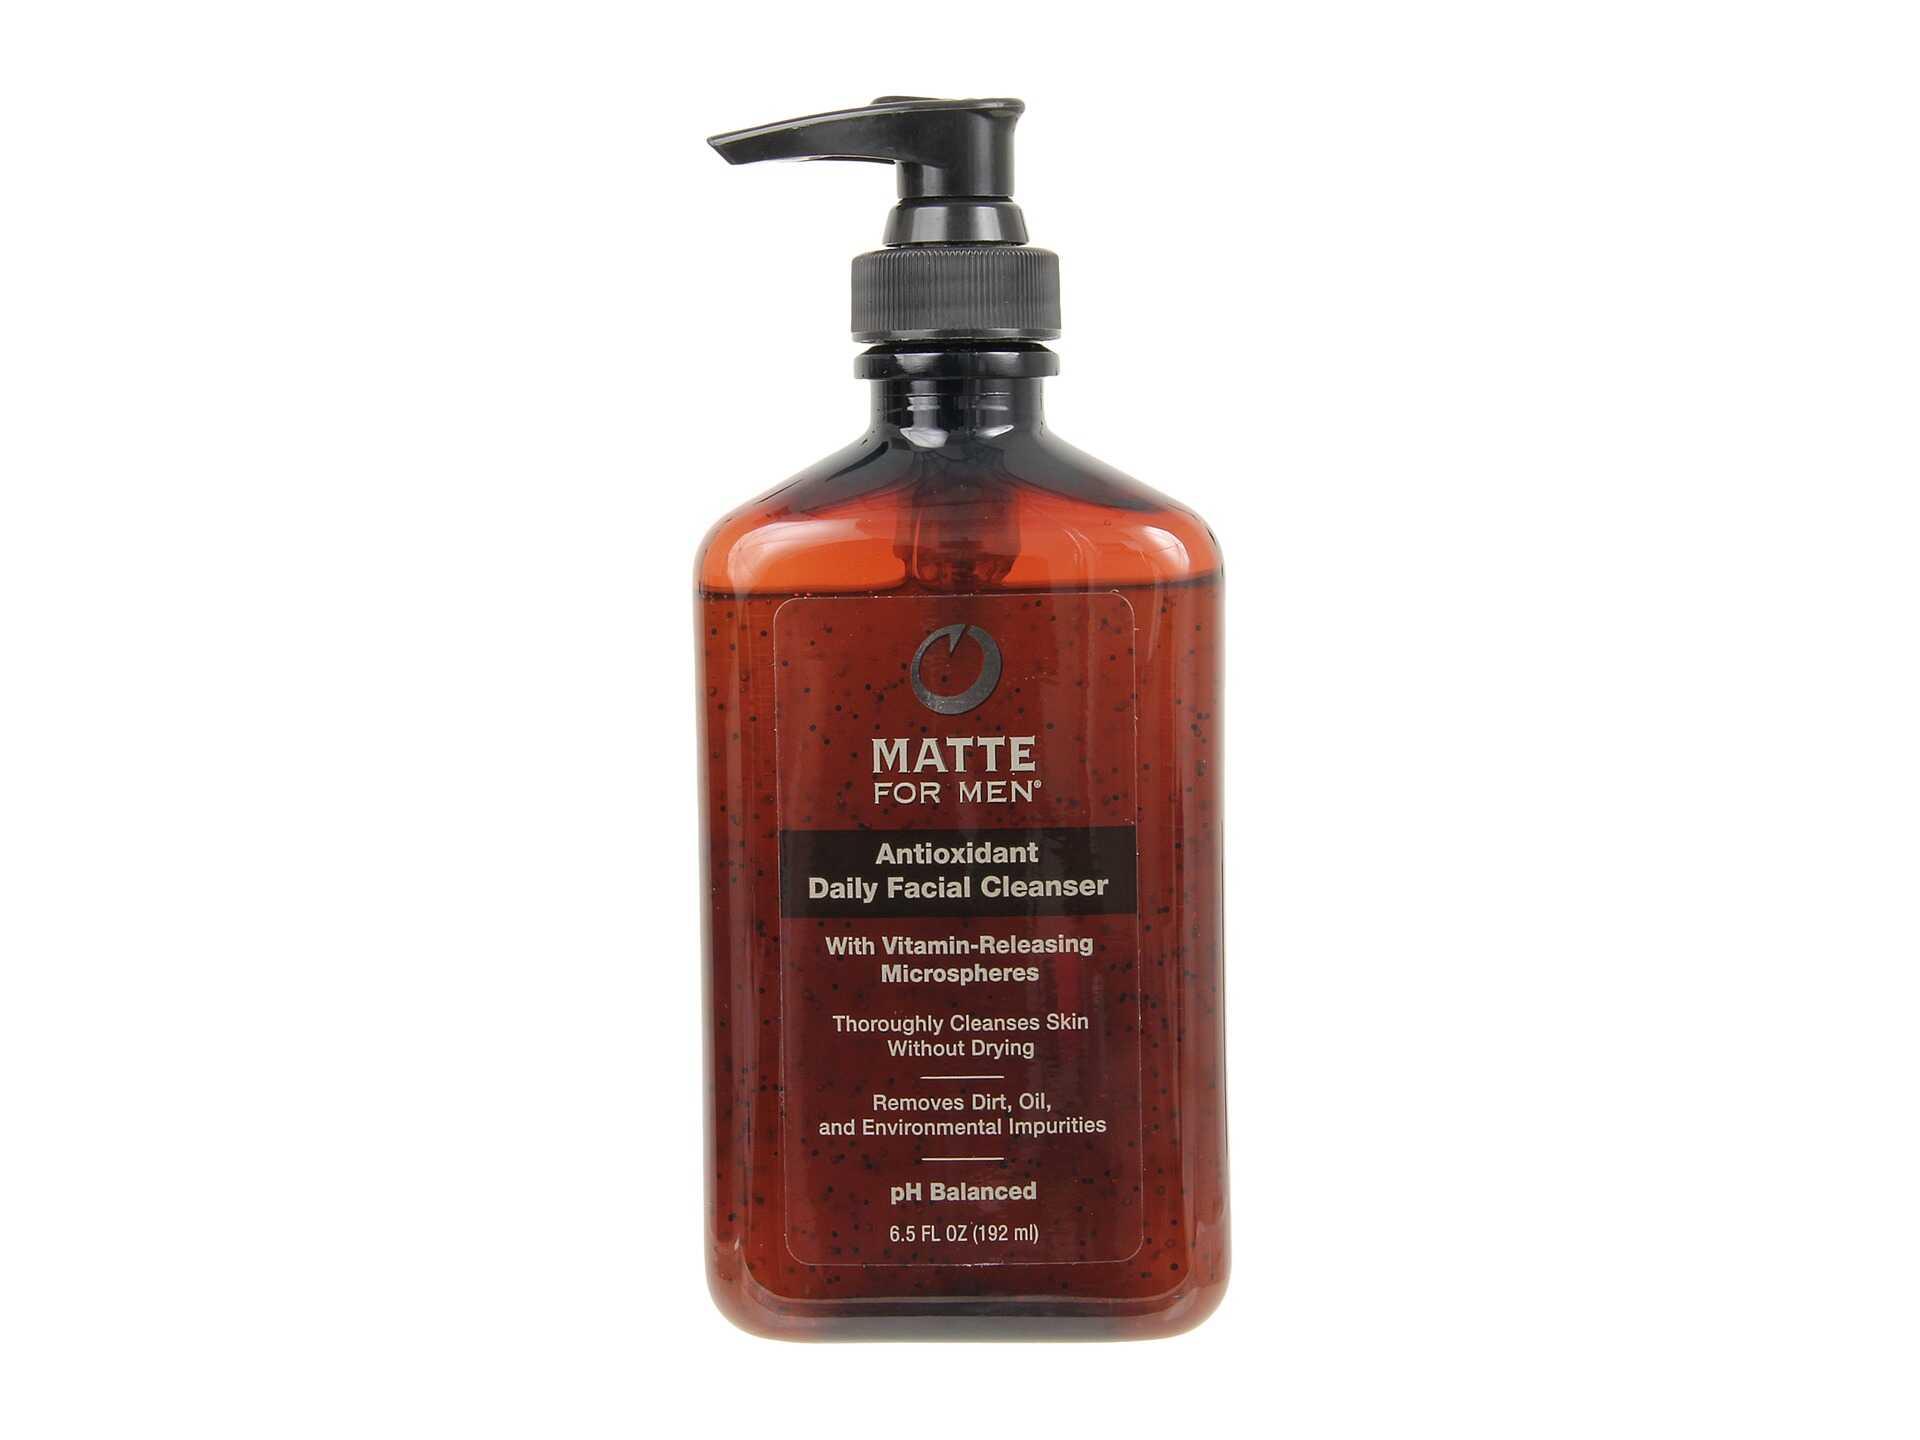 Matte for Men Antioxidant Daily Facial Cleanser 6.5oz No Color